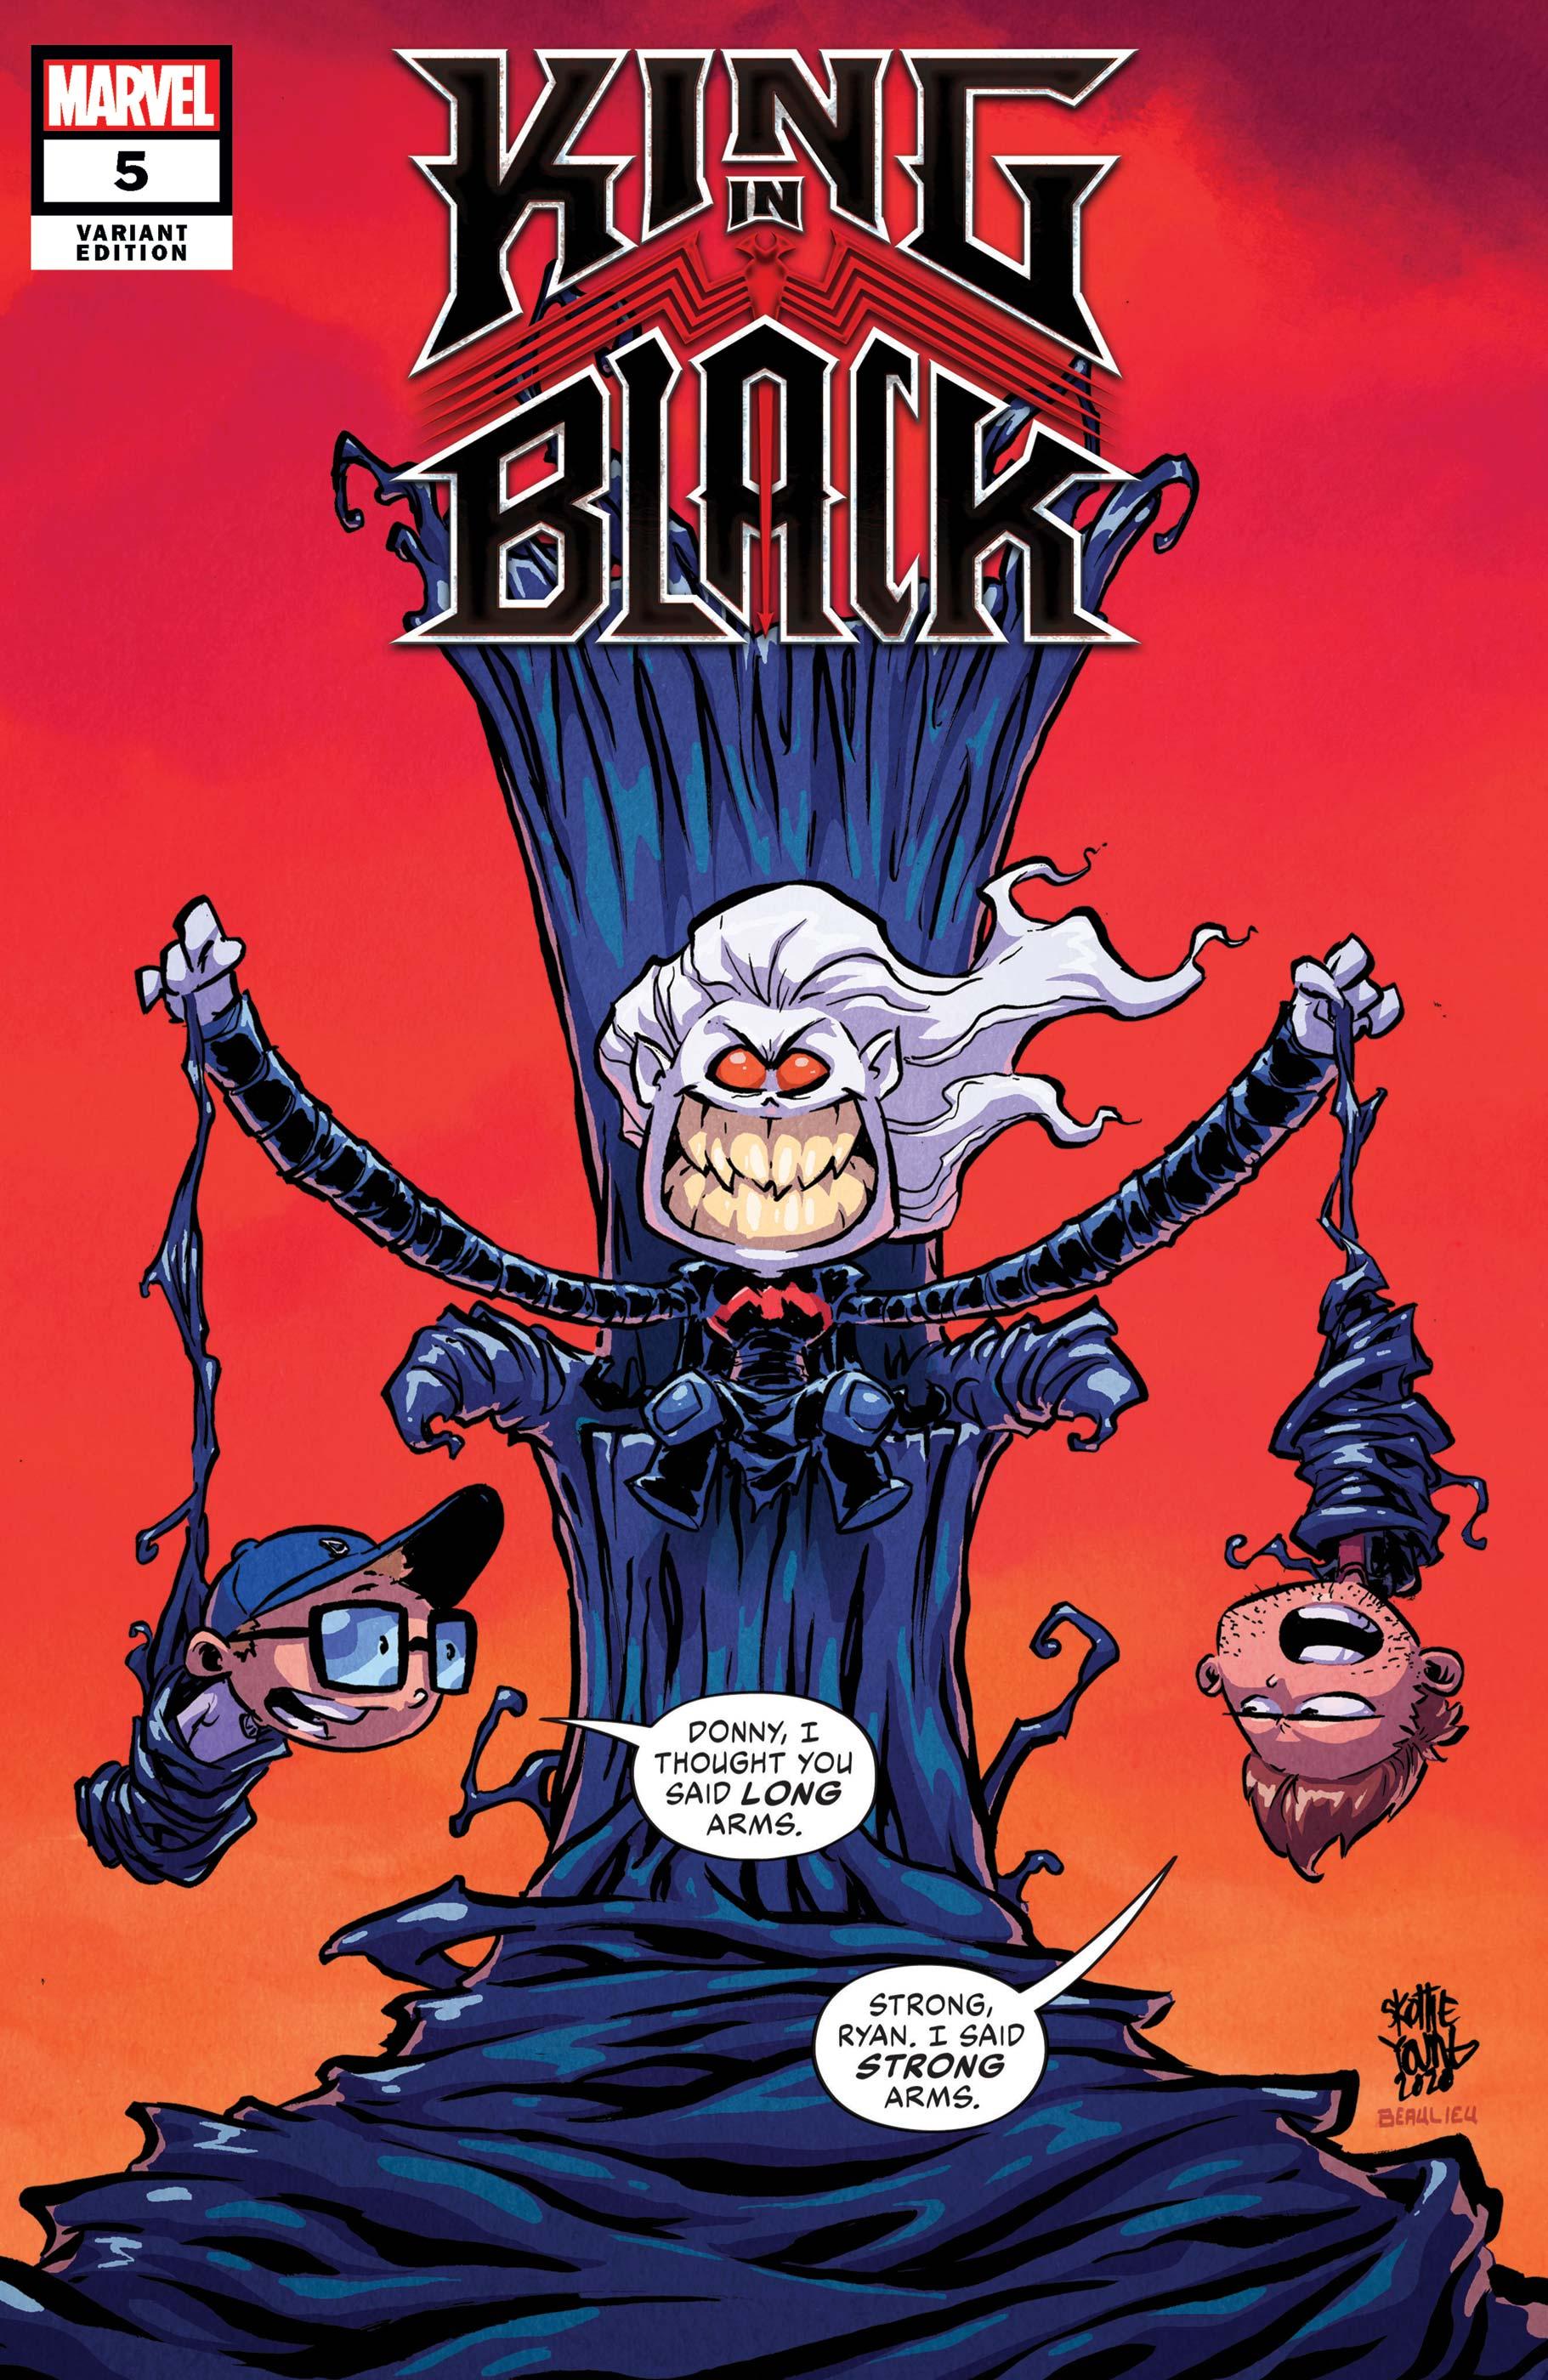 King in Black (2020) #5 (Variant)